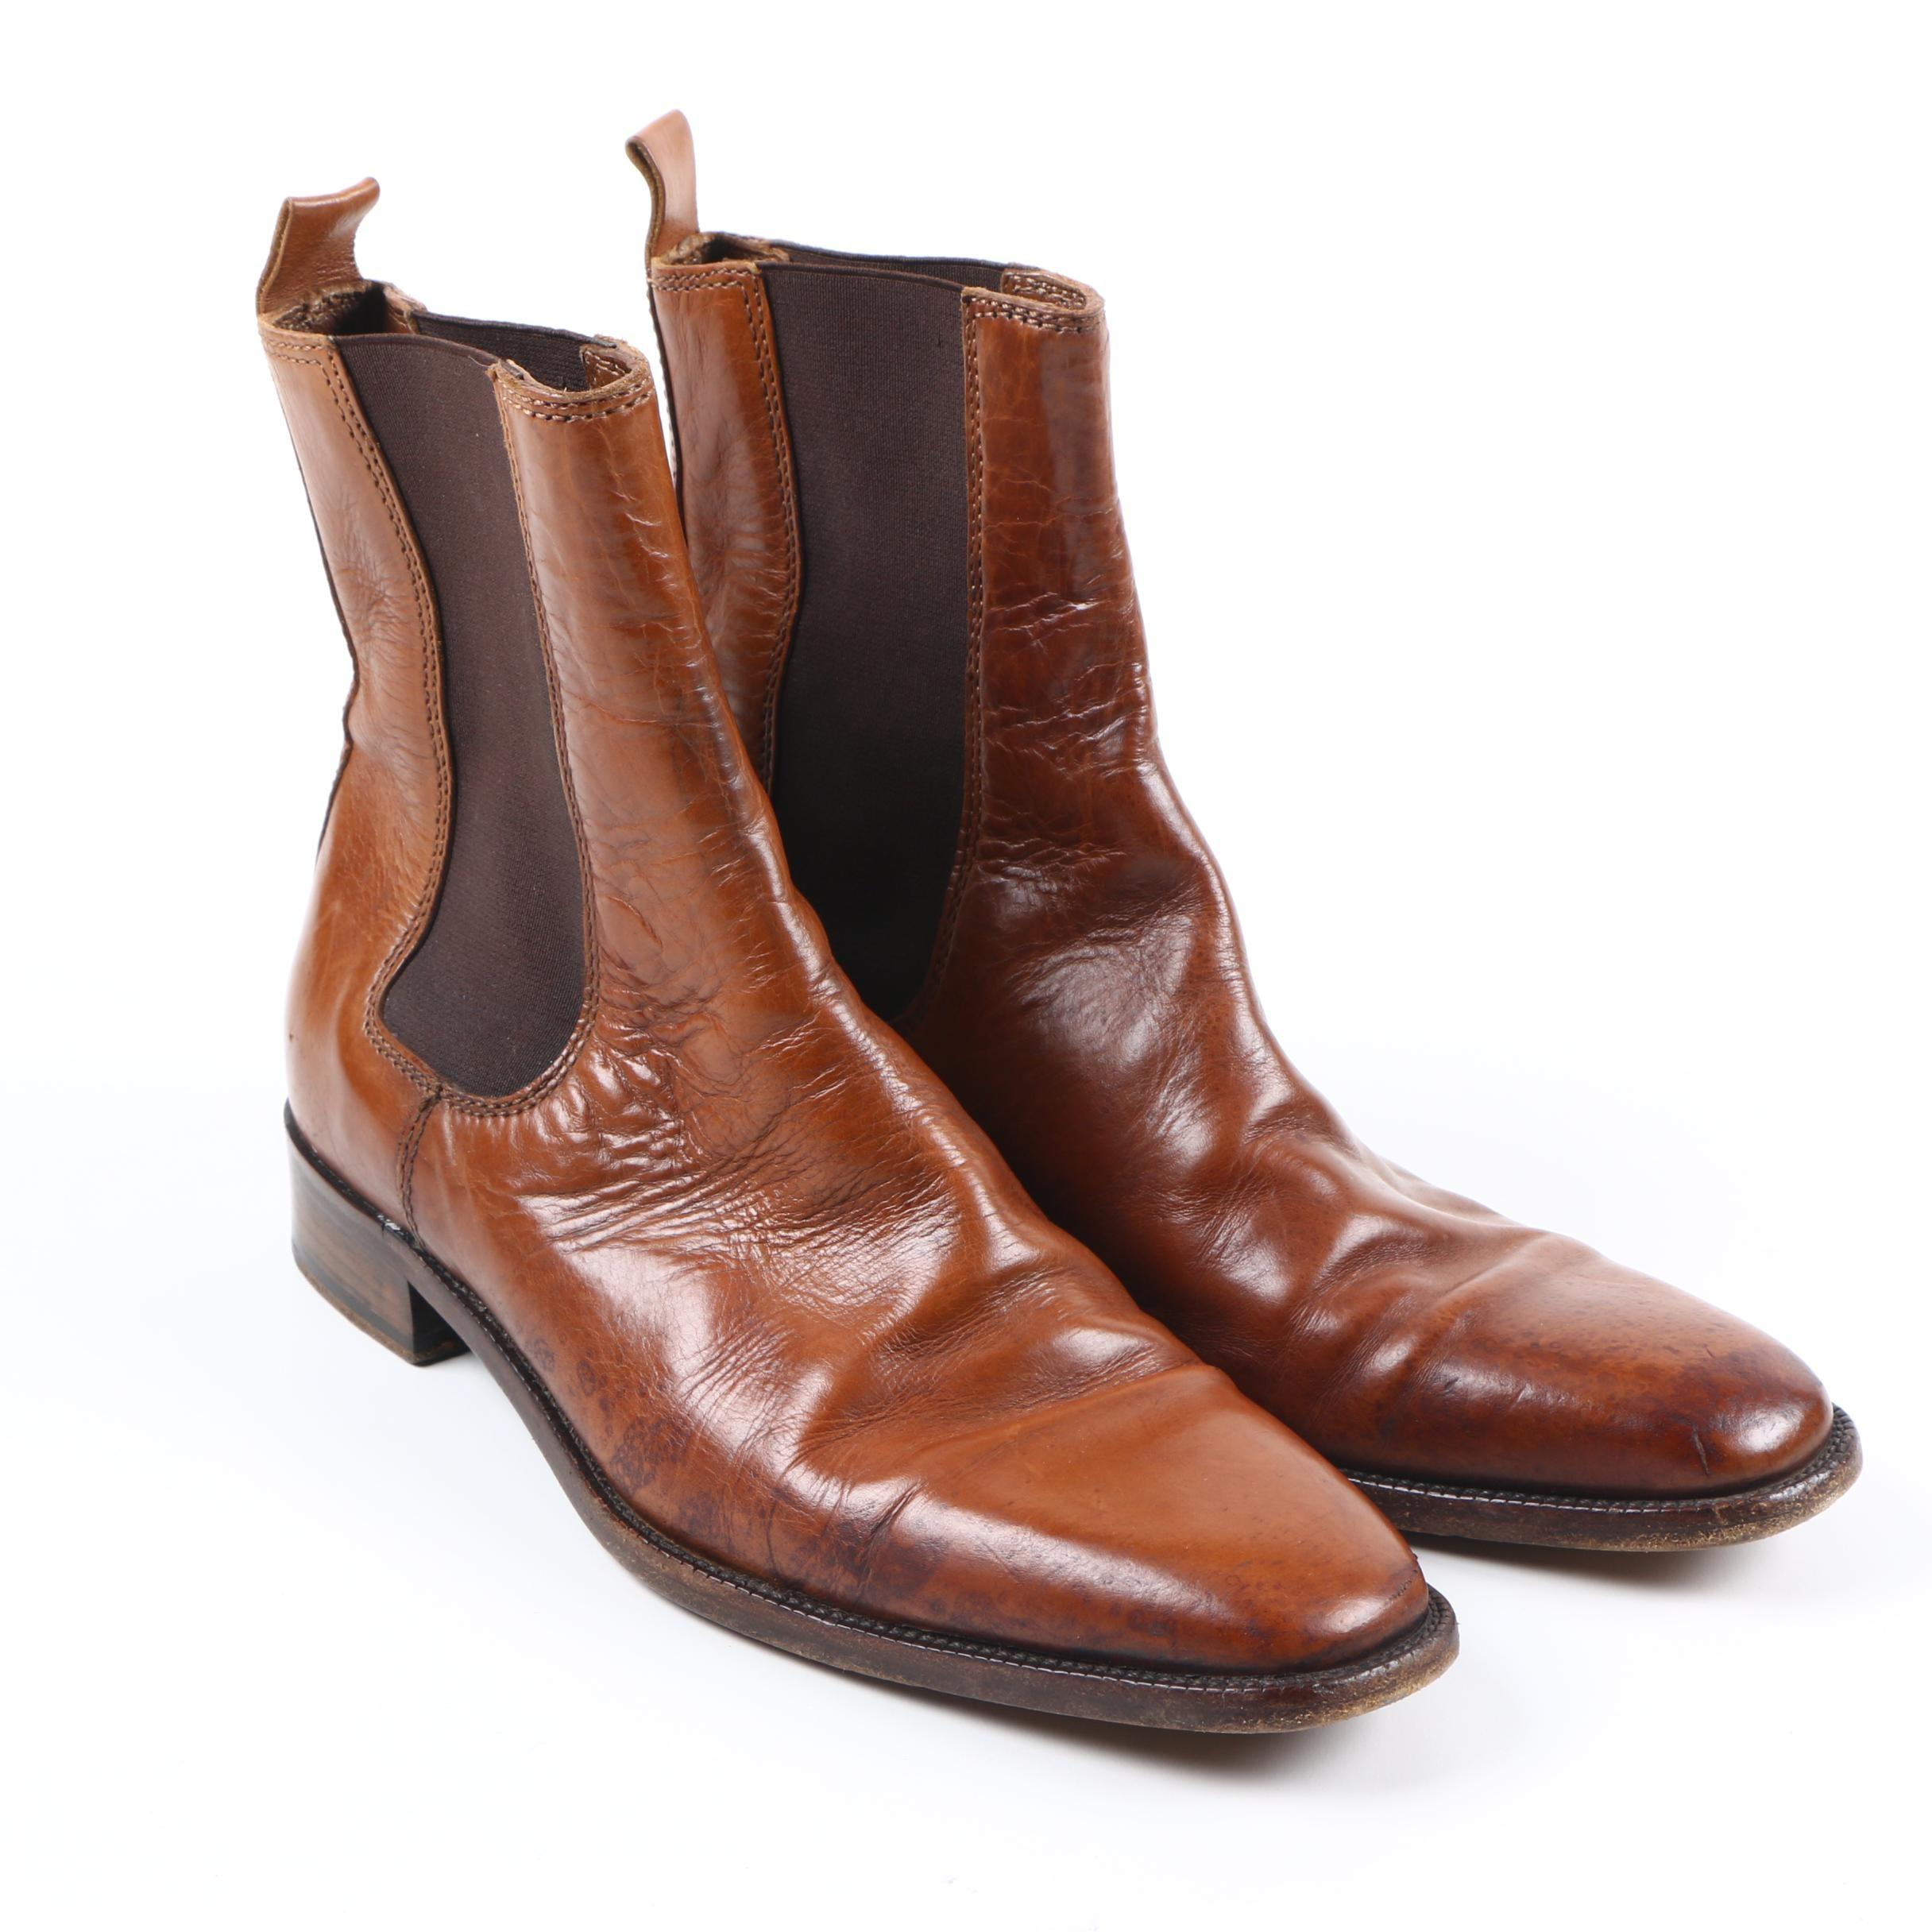 Ralph Lauren Brown Leather Boots